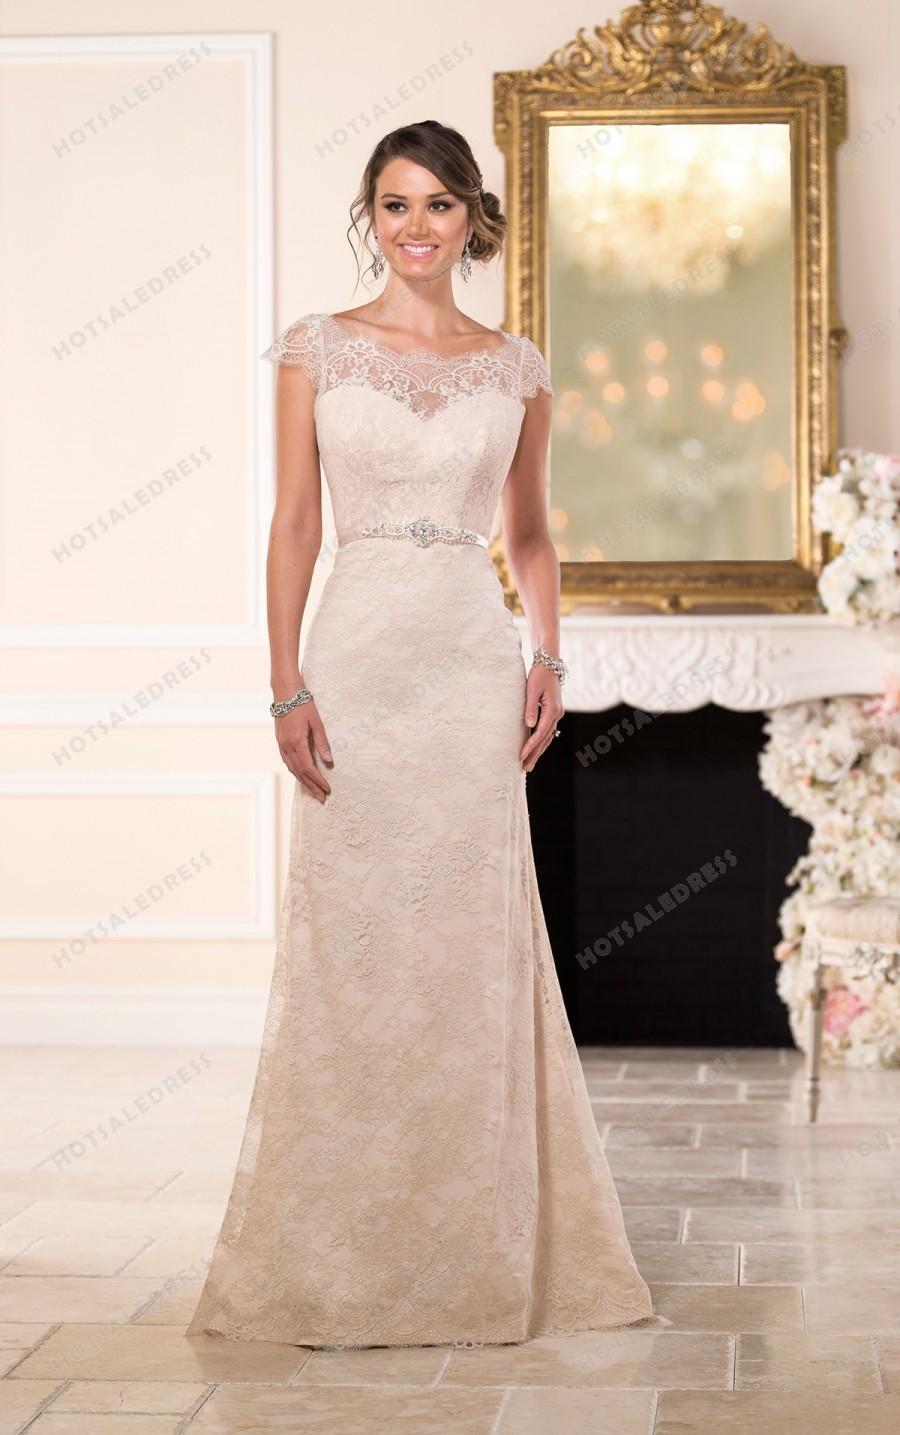 stella york vintage inspired wedding dresses style vintage inspired wedding dresses Stella York Vintage Inspired Wedding Dresses Style